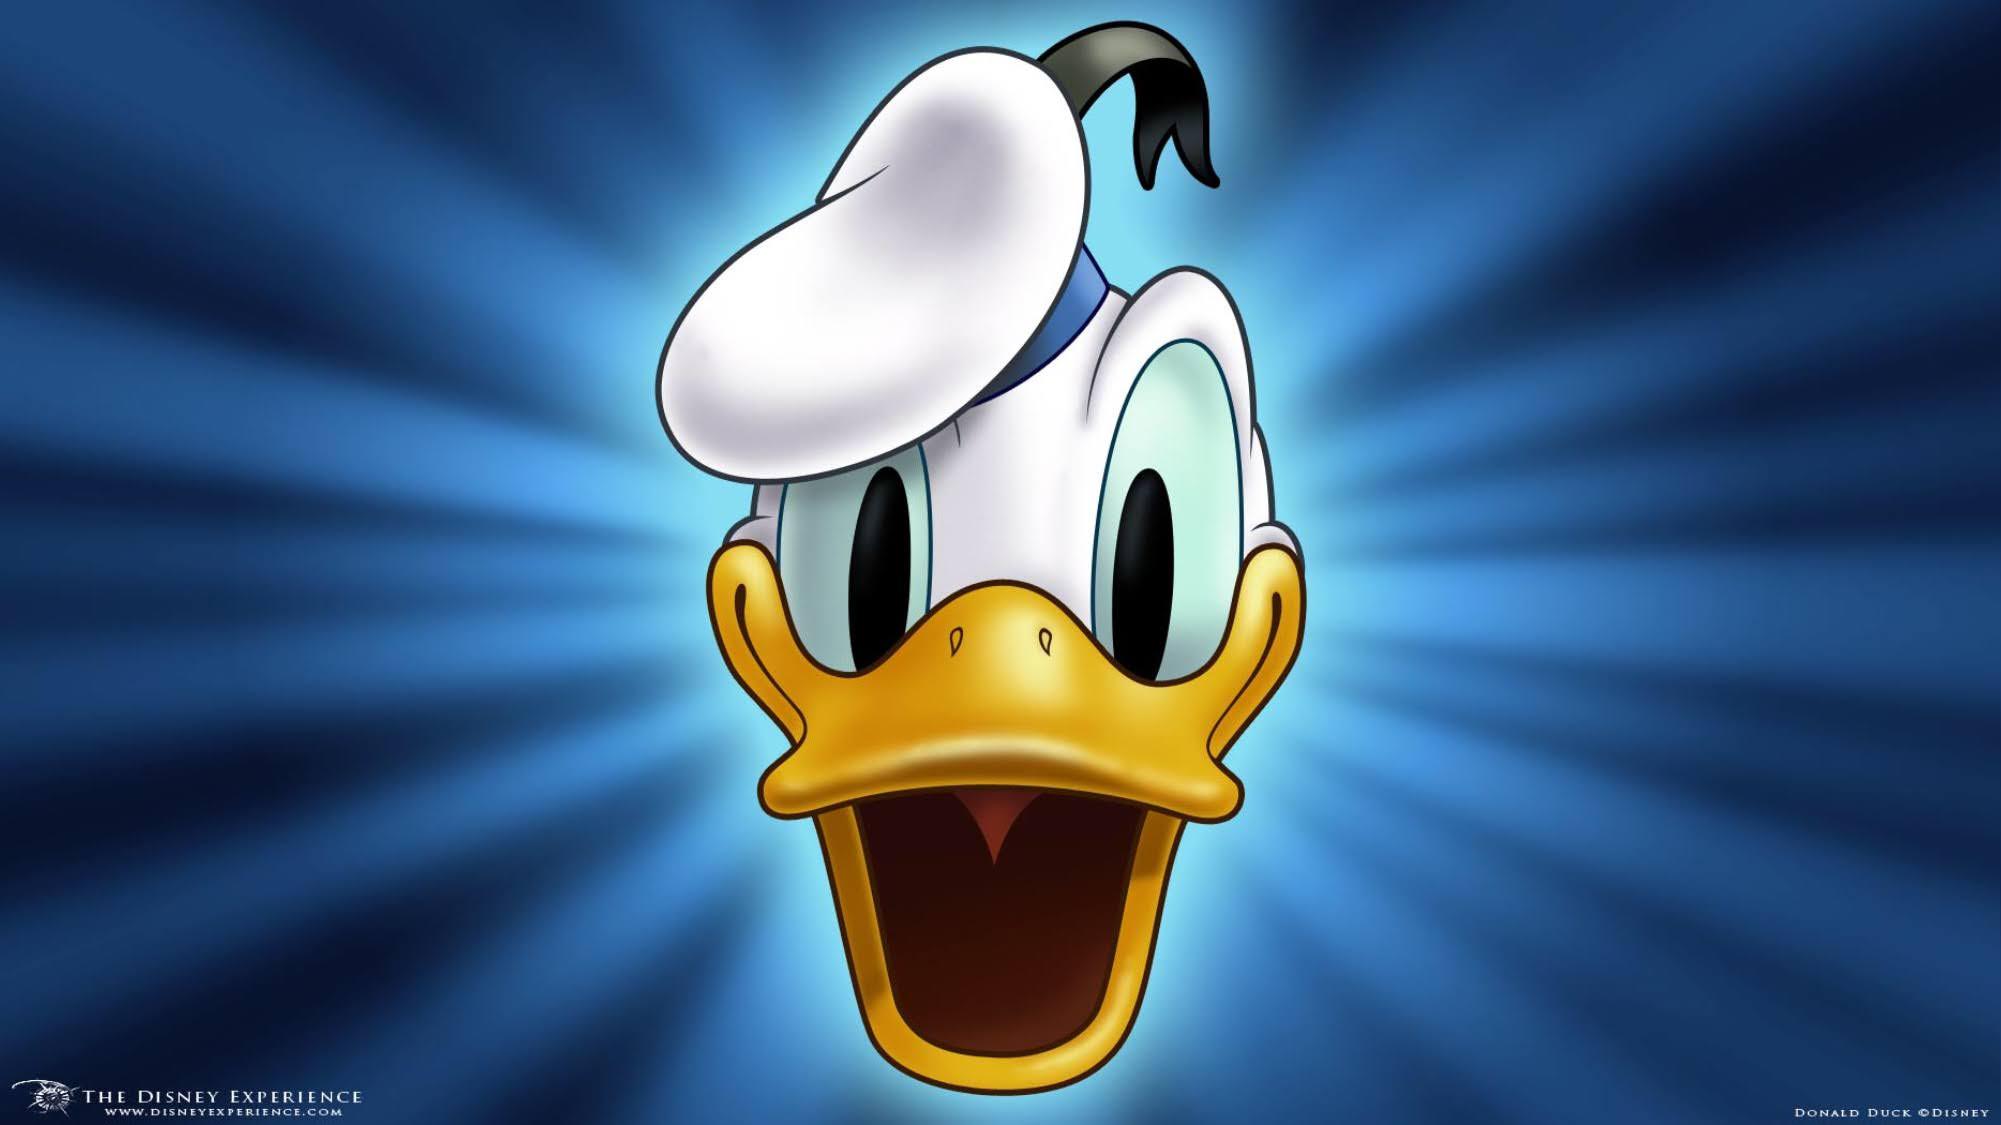 Donald duck song disney wiki fandom powered by wikia